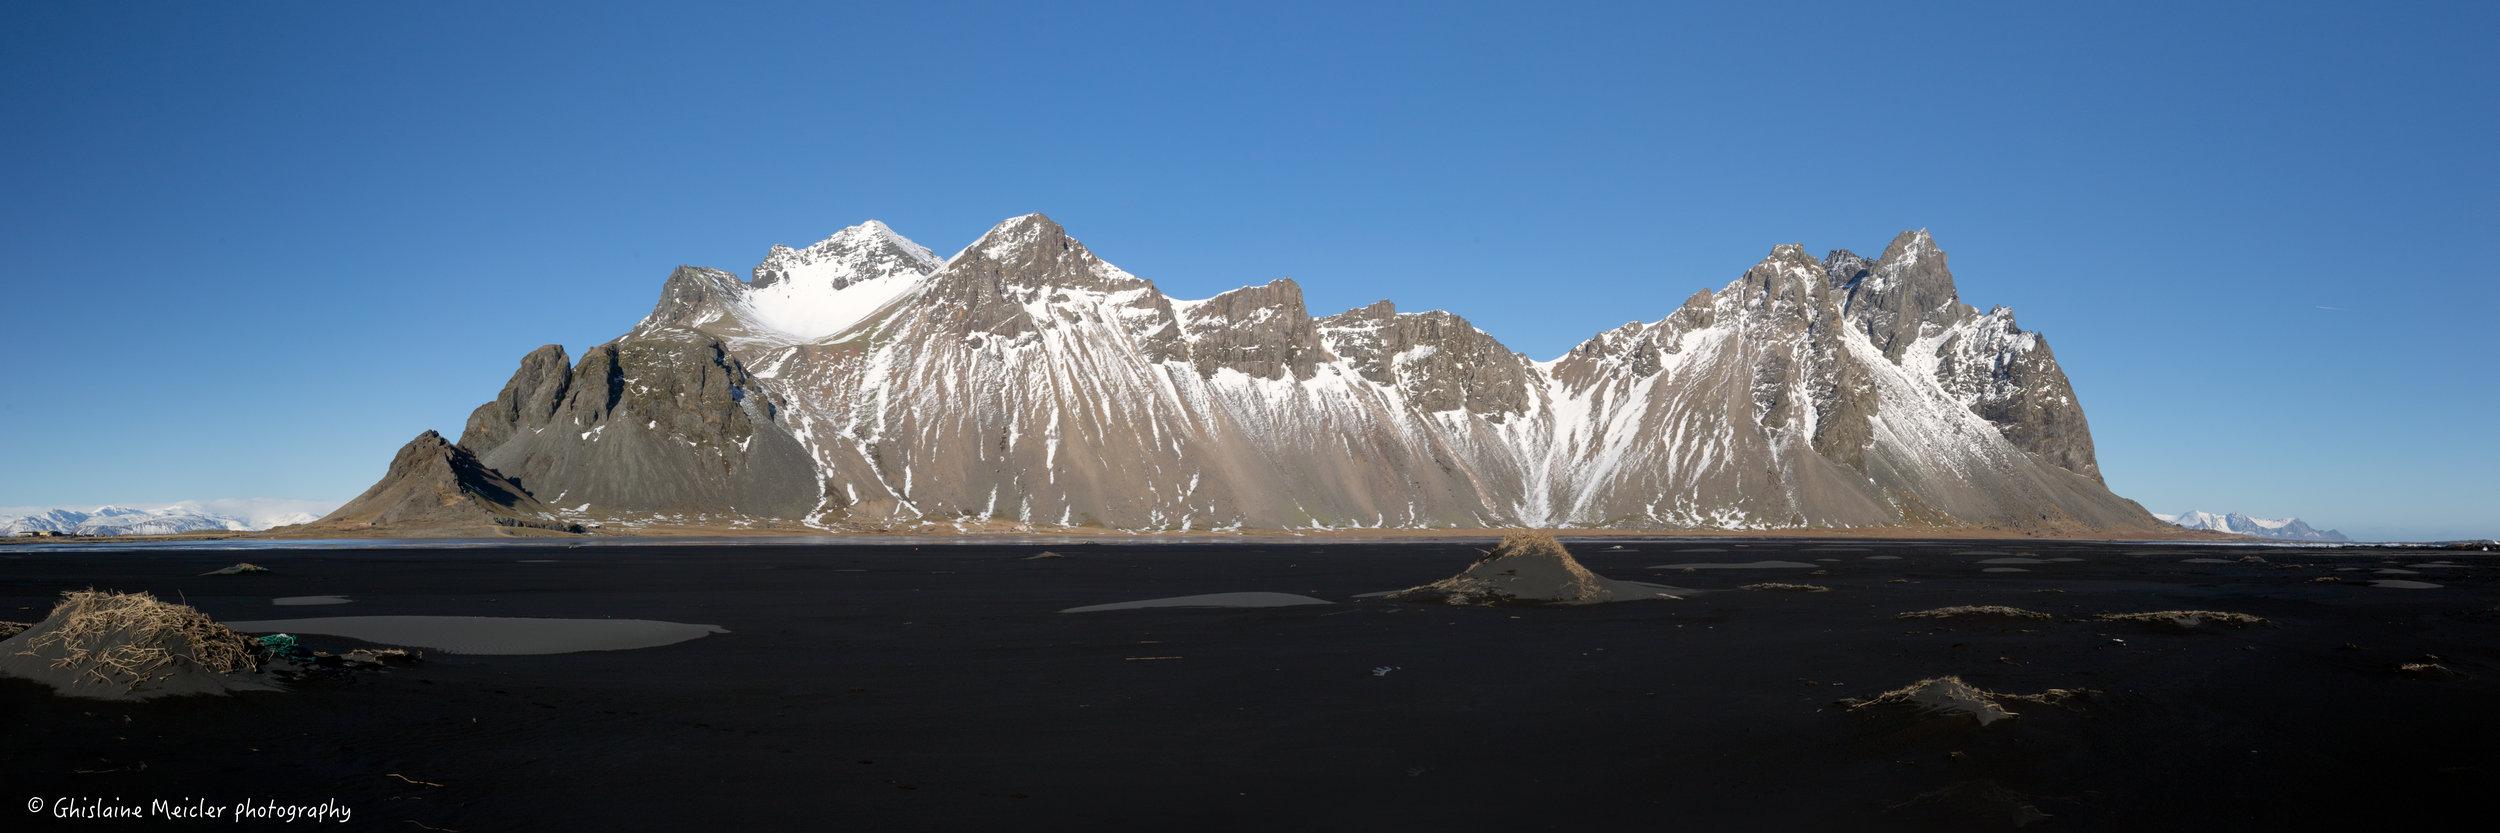 Islande-67.jpg